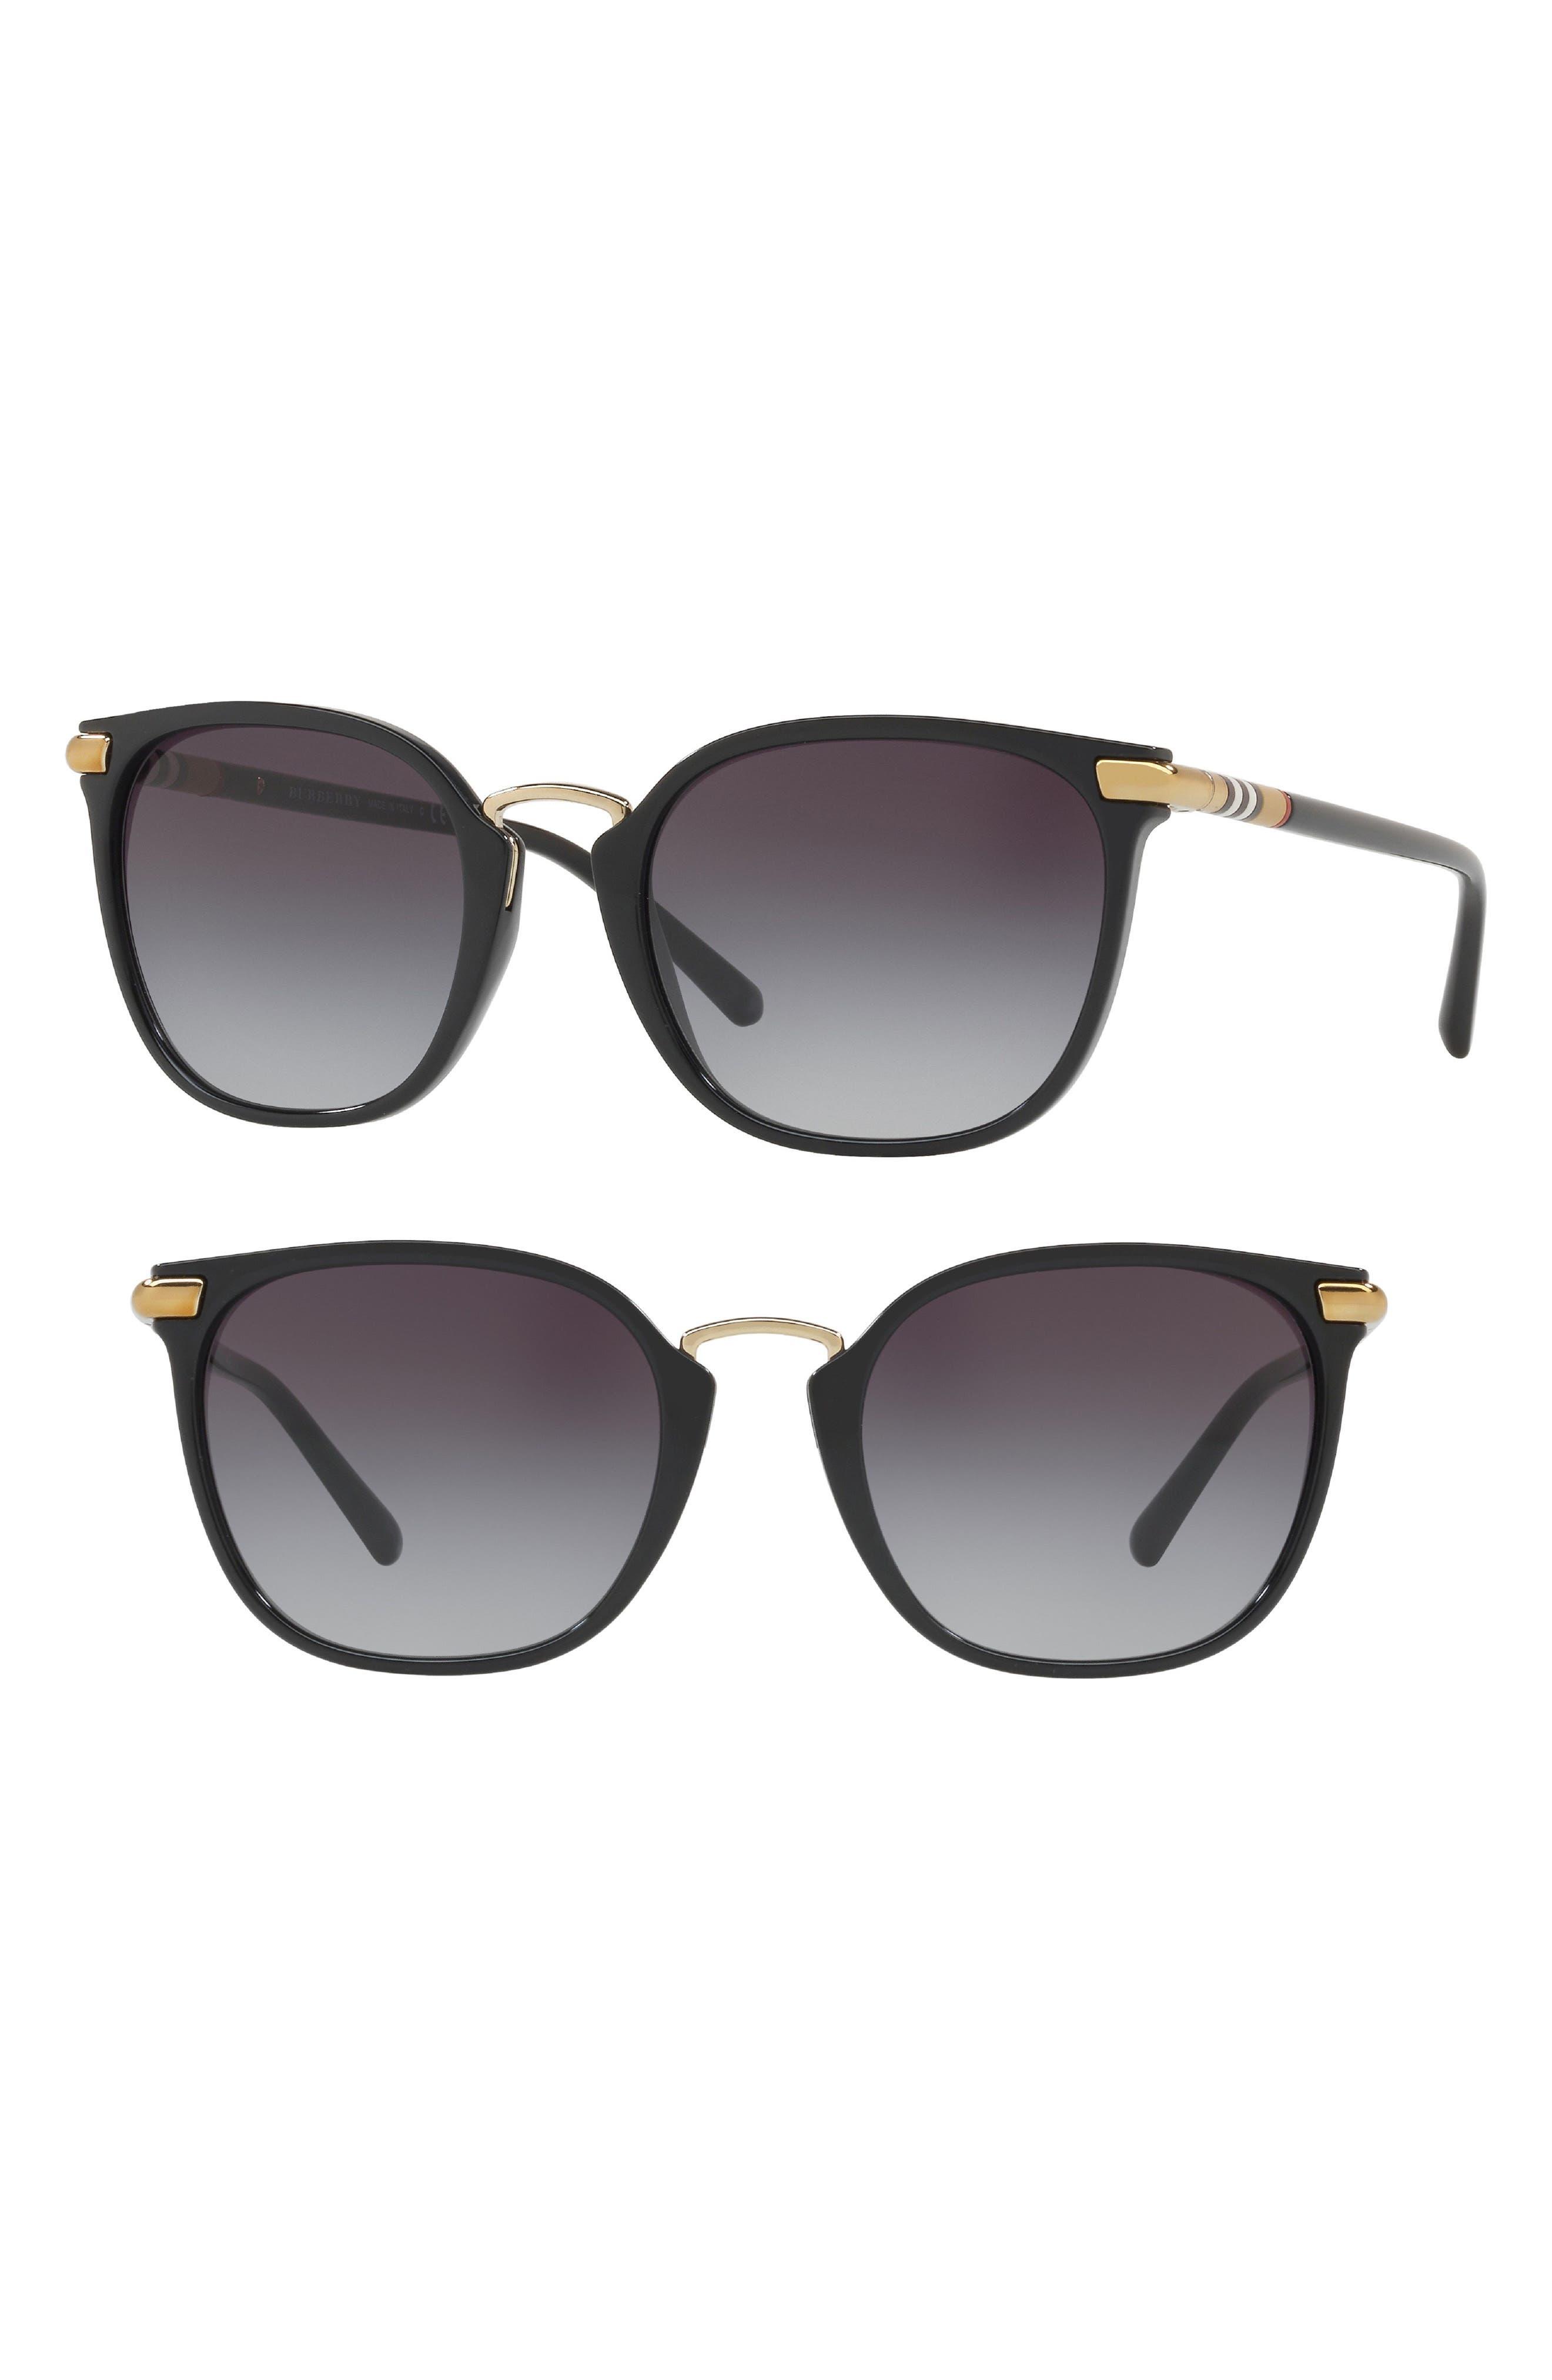 53mm Gradient Square Sunglasses,                             Alternate thumbnail 4, color,